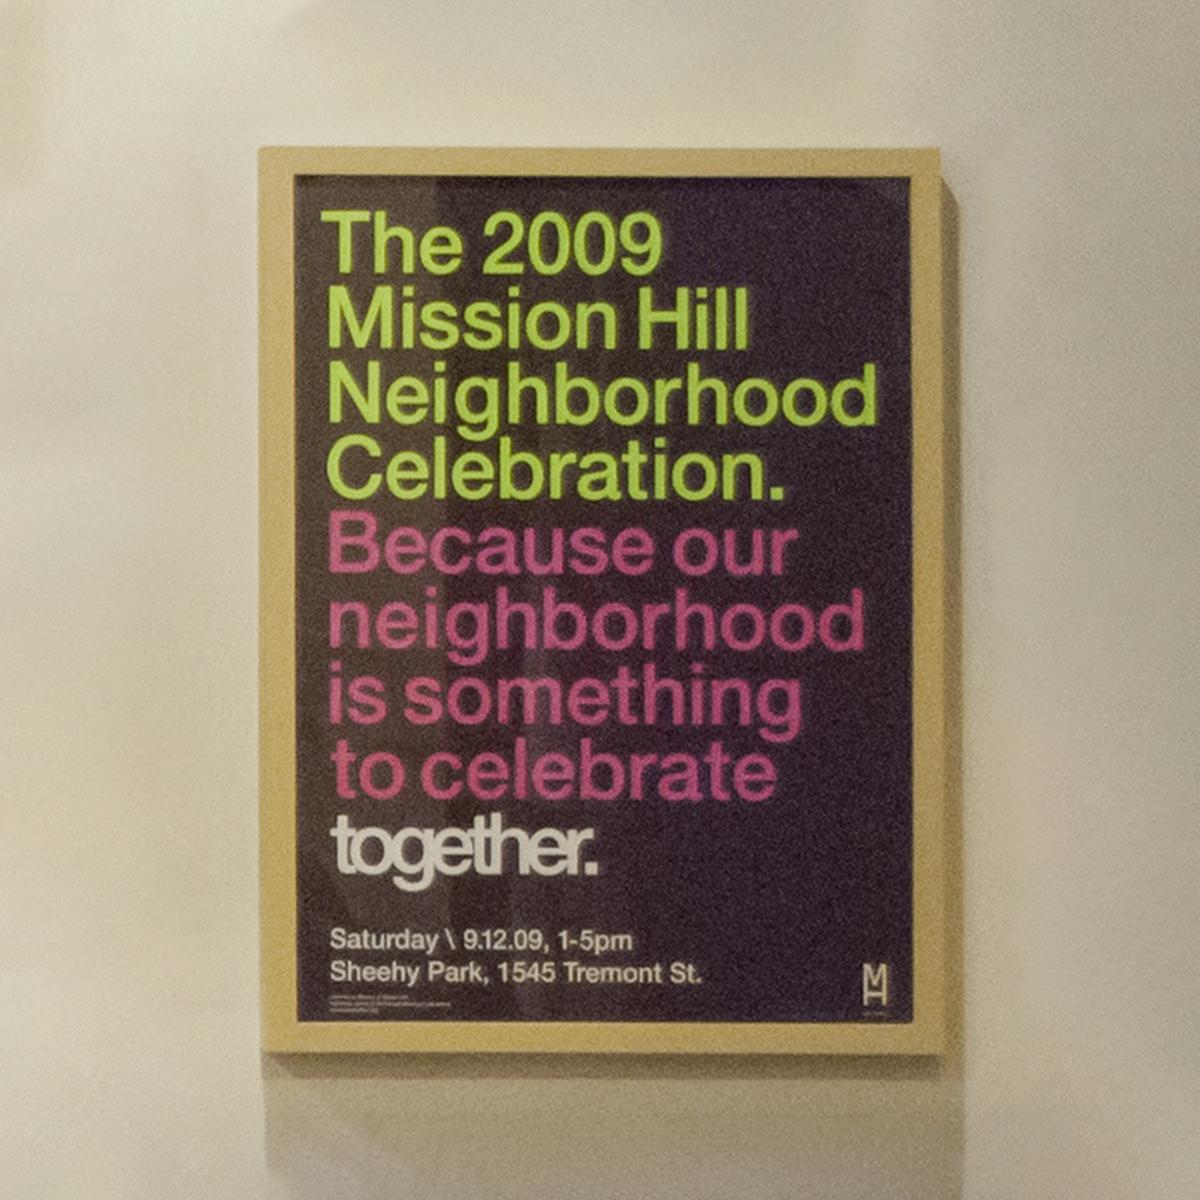 2009 Mission Hill Neighborhood Celebration Poster